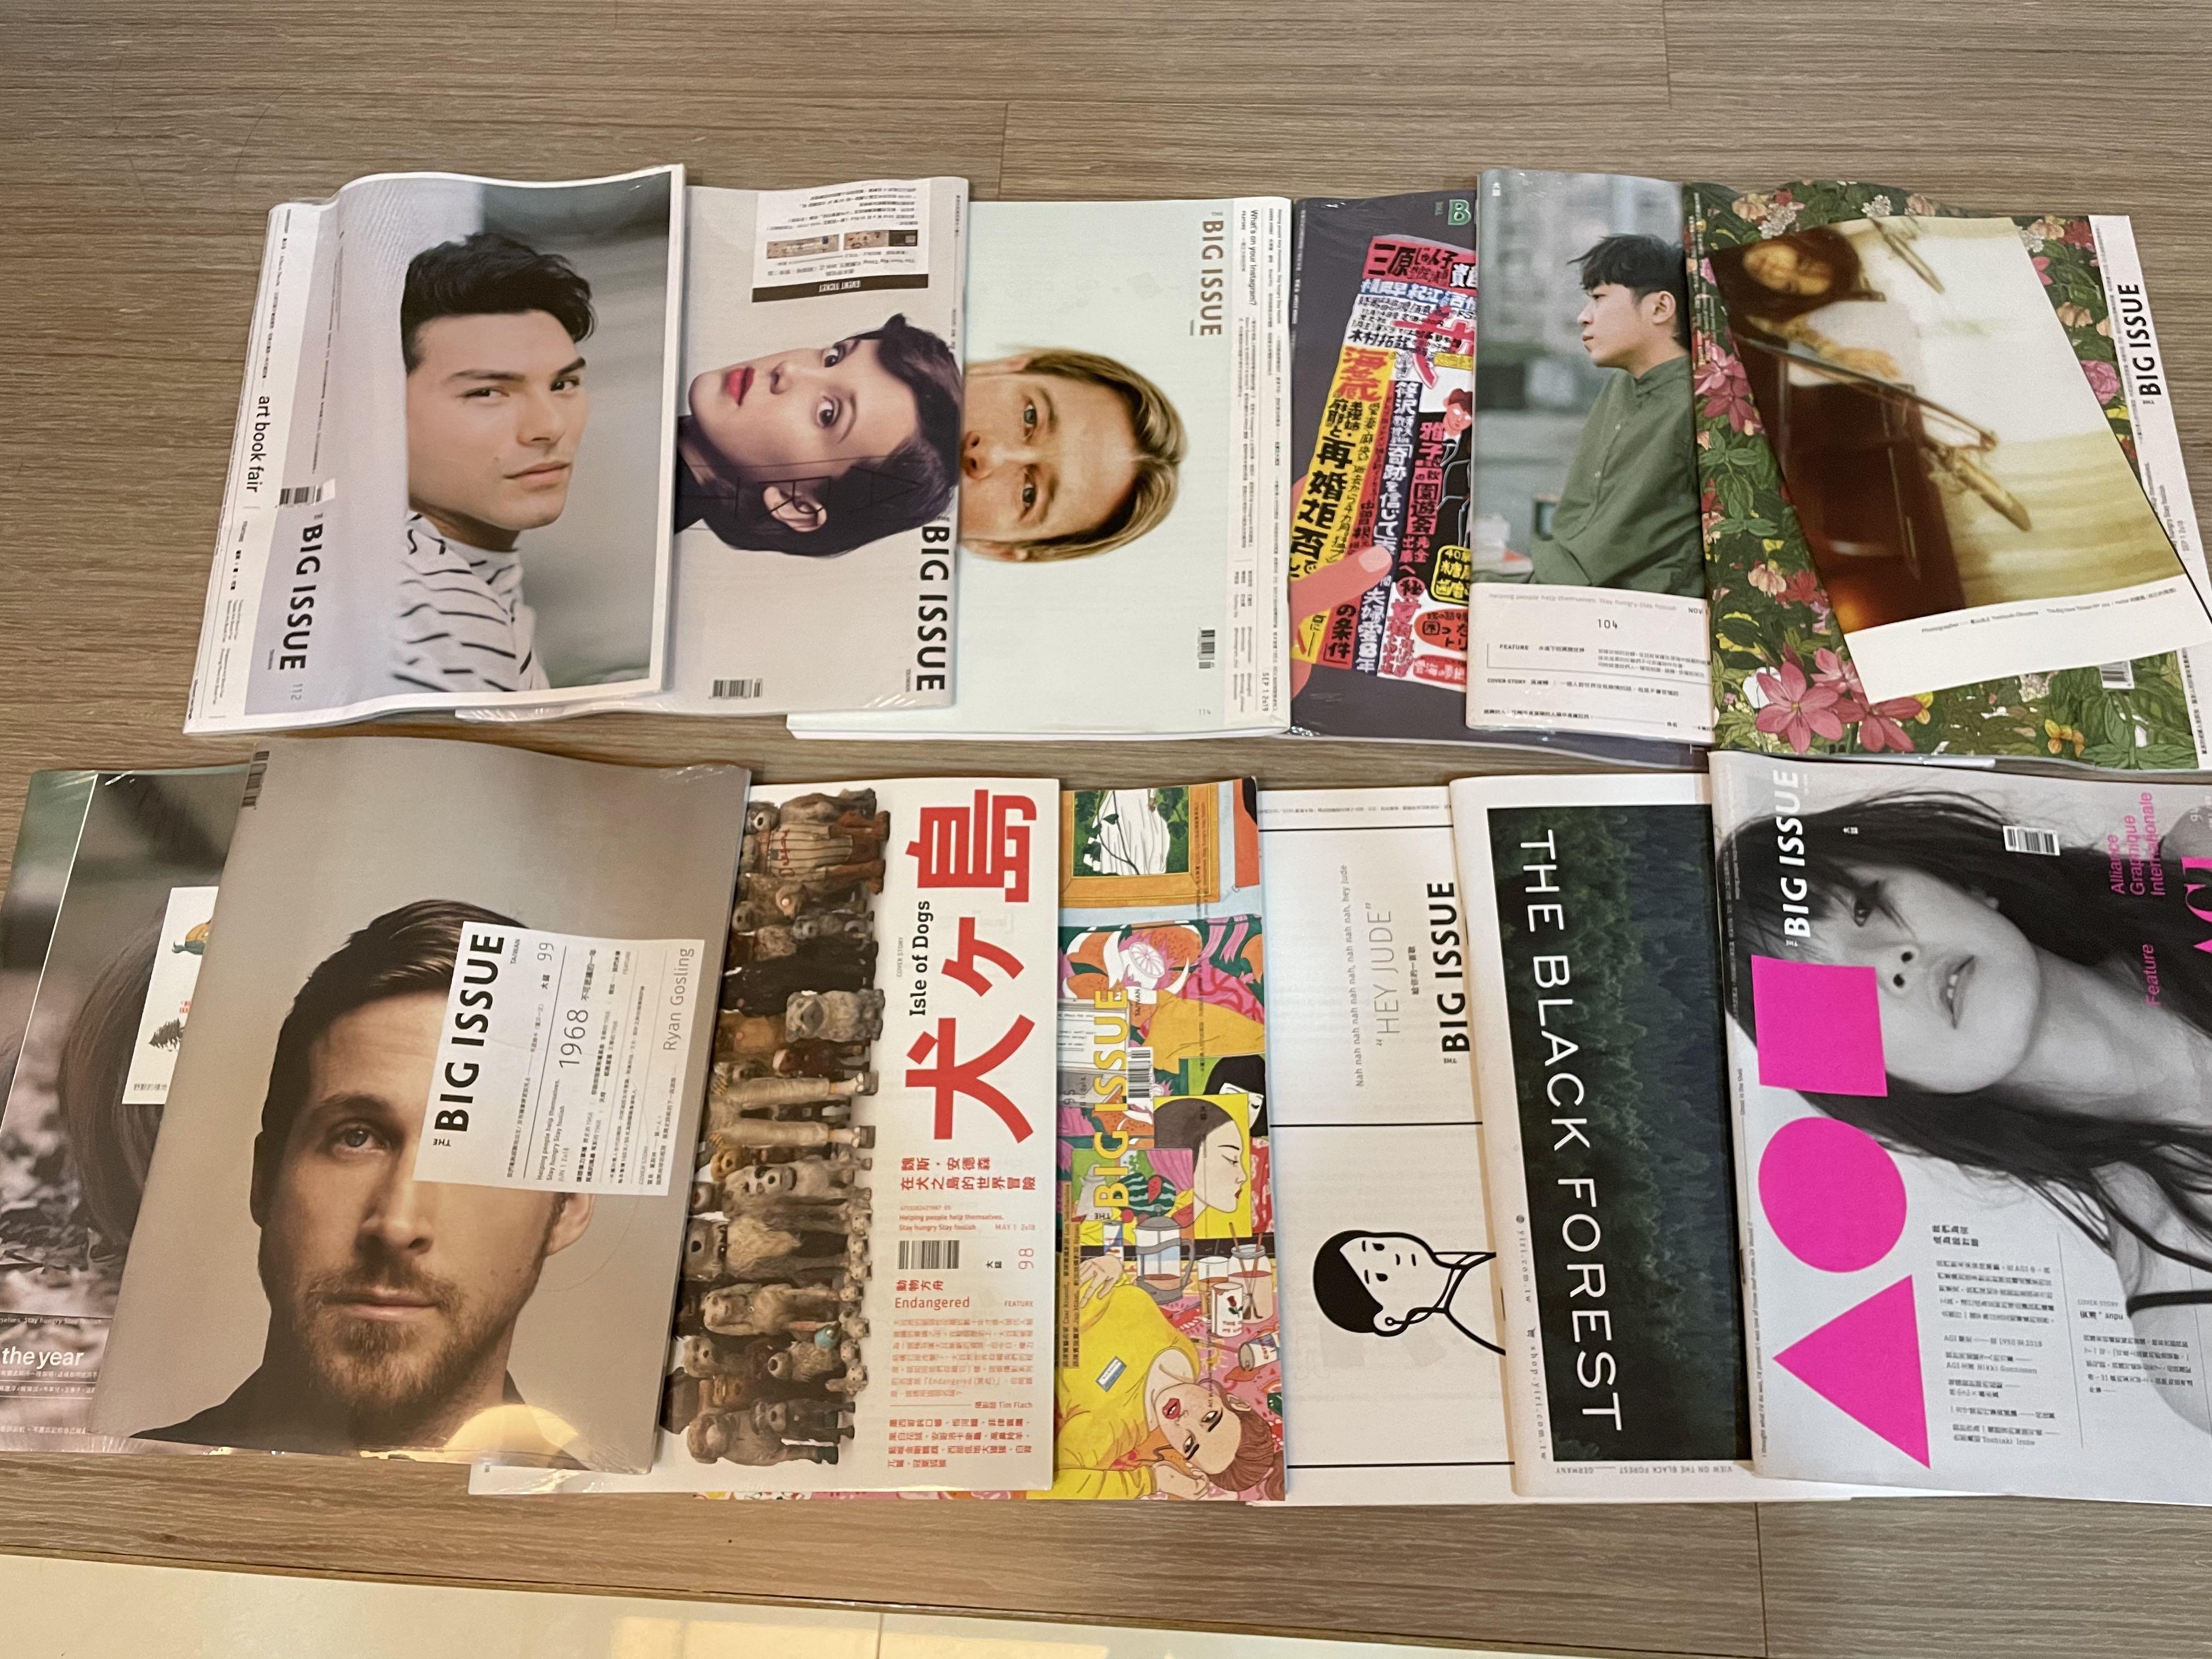 大誌雜誌 Big Issue